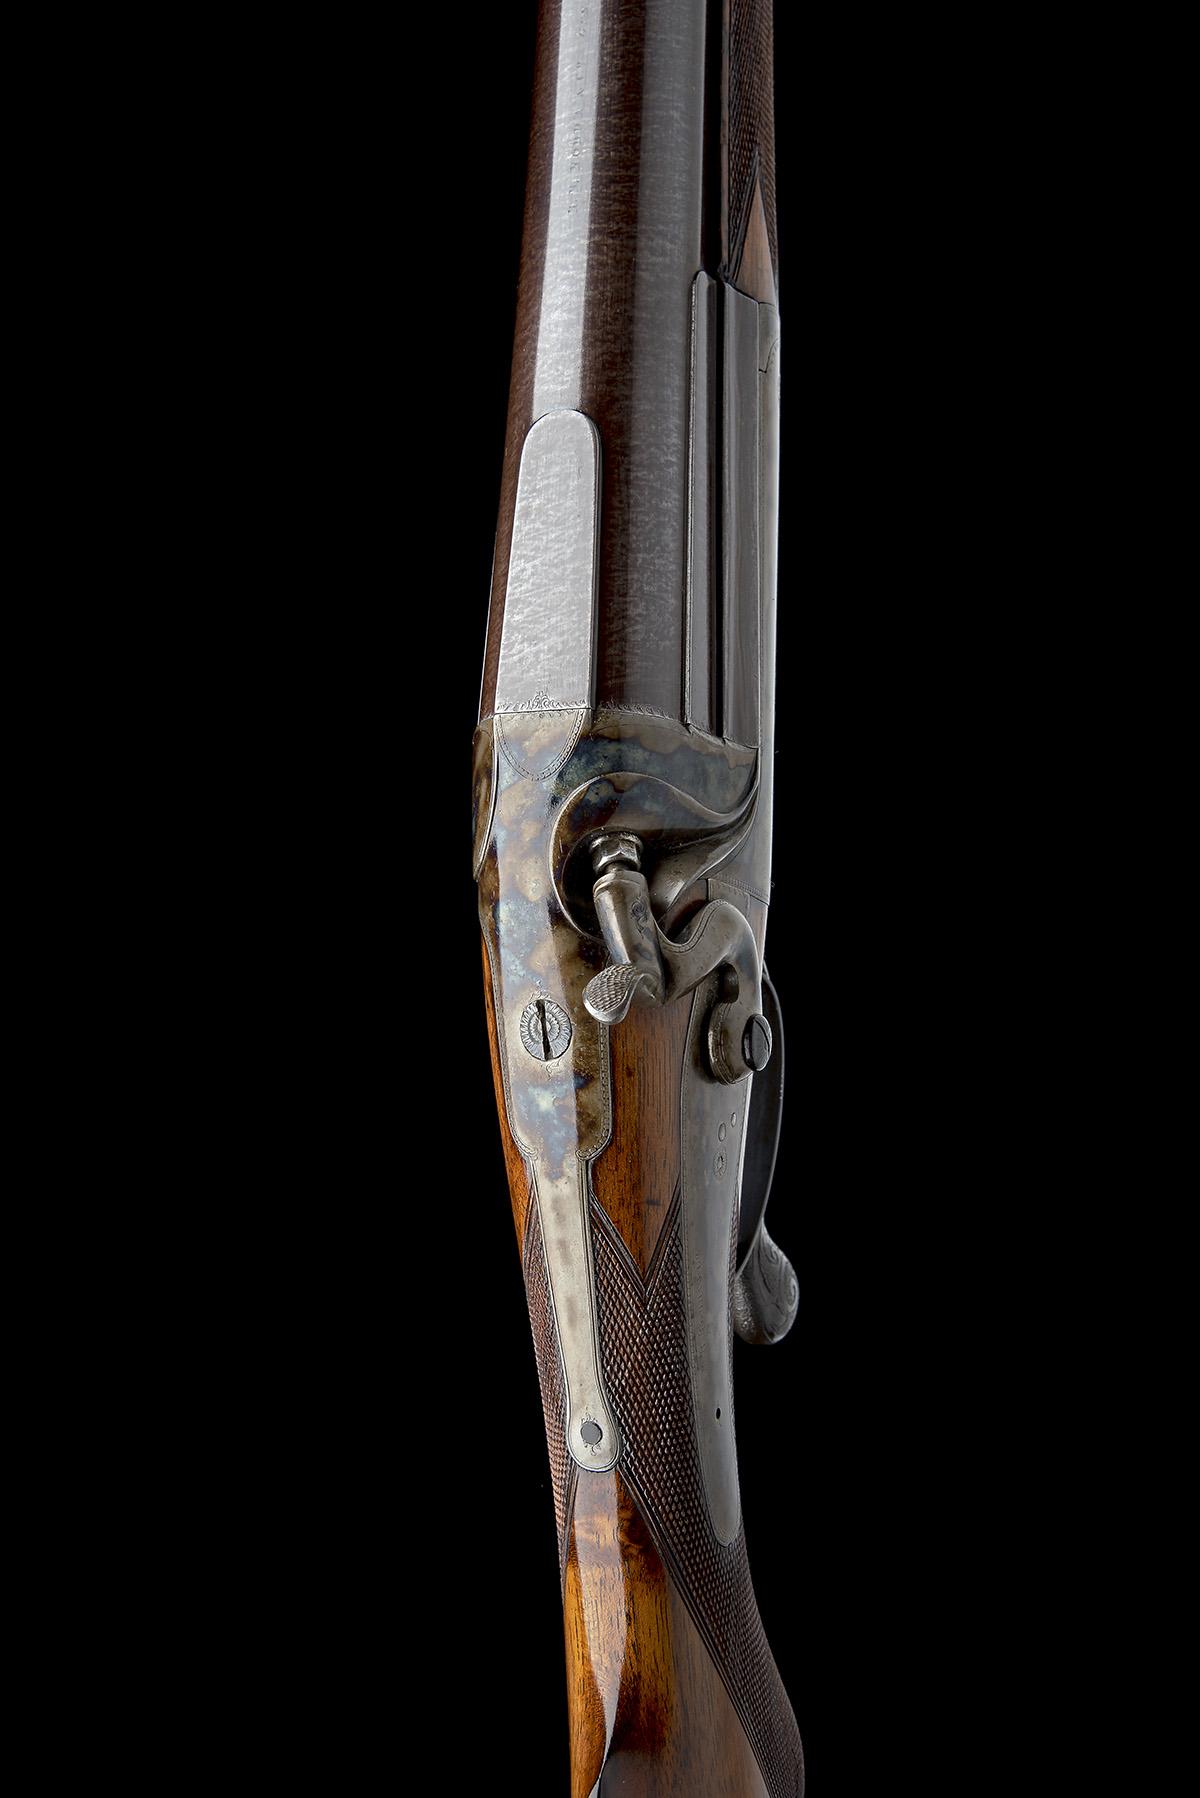 R.B. RODDA A 4-BORE SINGLE-BARRELLED ROTARY-UNDERLEVER HAMMERGUN, serial no. 26013, circa 1880, 38 - Image 4 of 8